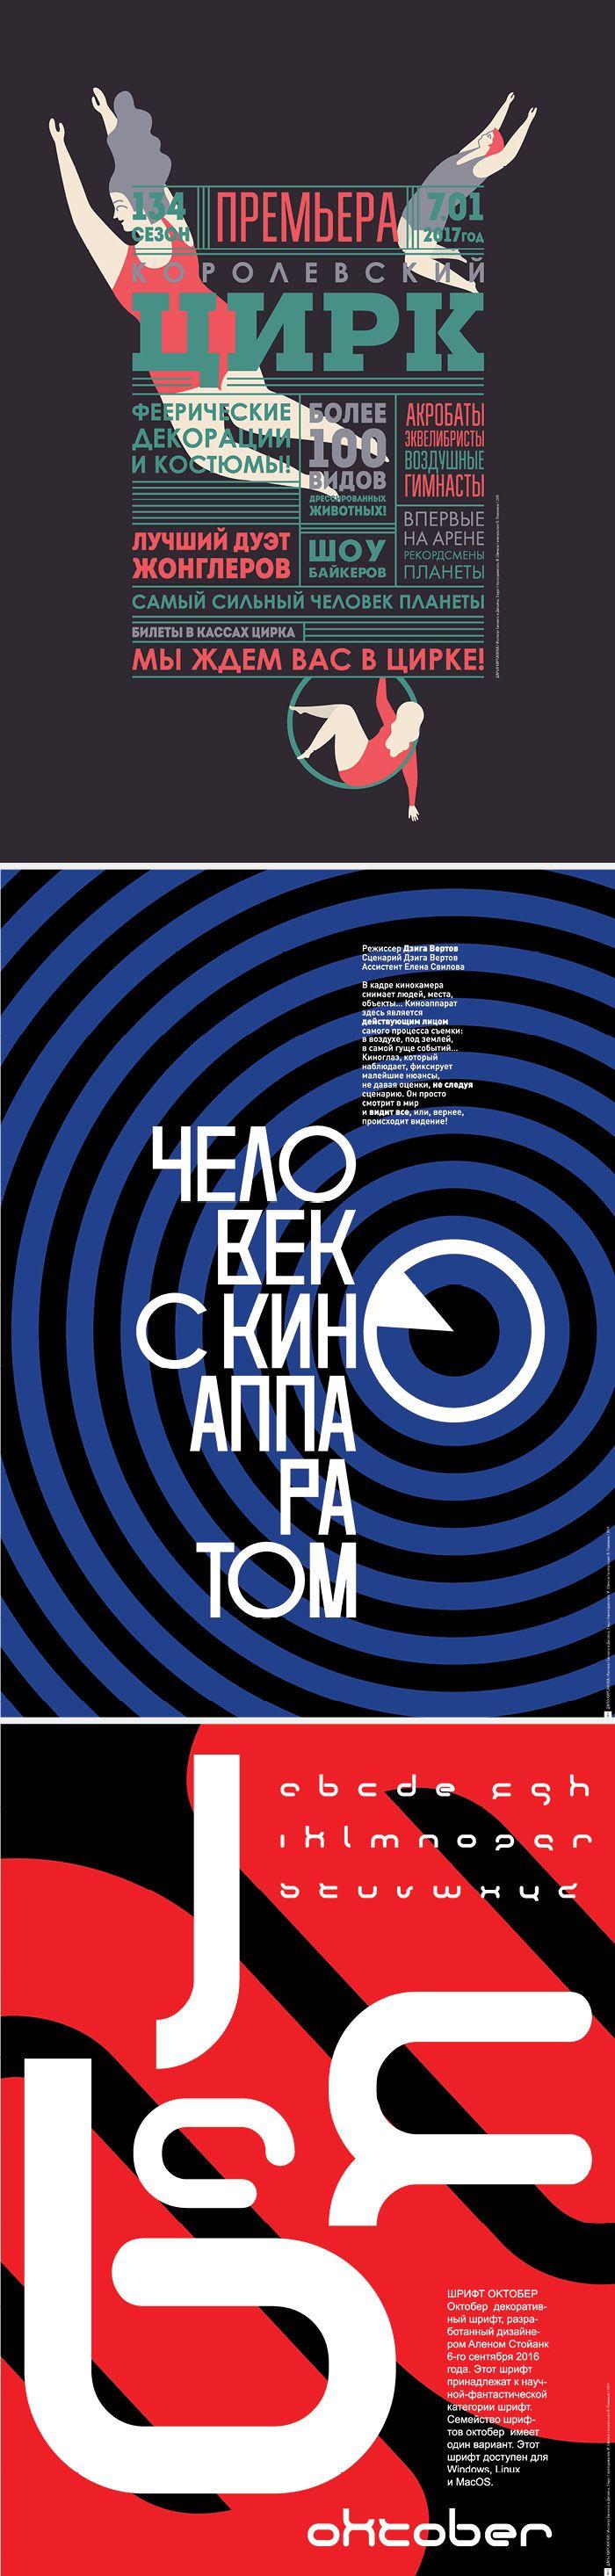 Типографика. Акциденция | 3 курс, студентка Дарья Кирсанова | преподаватель Шичков И. Display typography | third year, student Darya Kirsanova | tutor Schichkov Igor